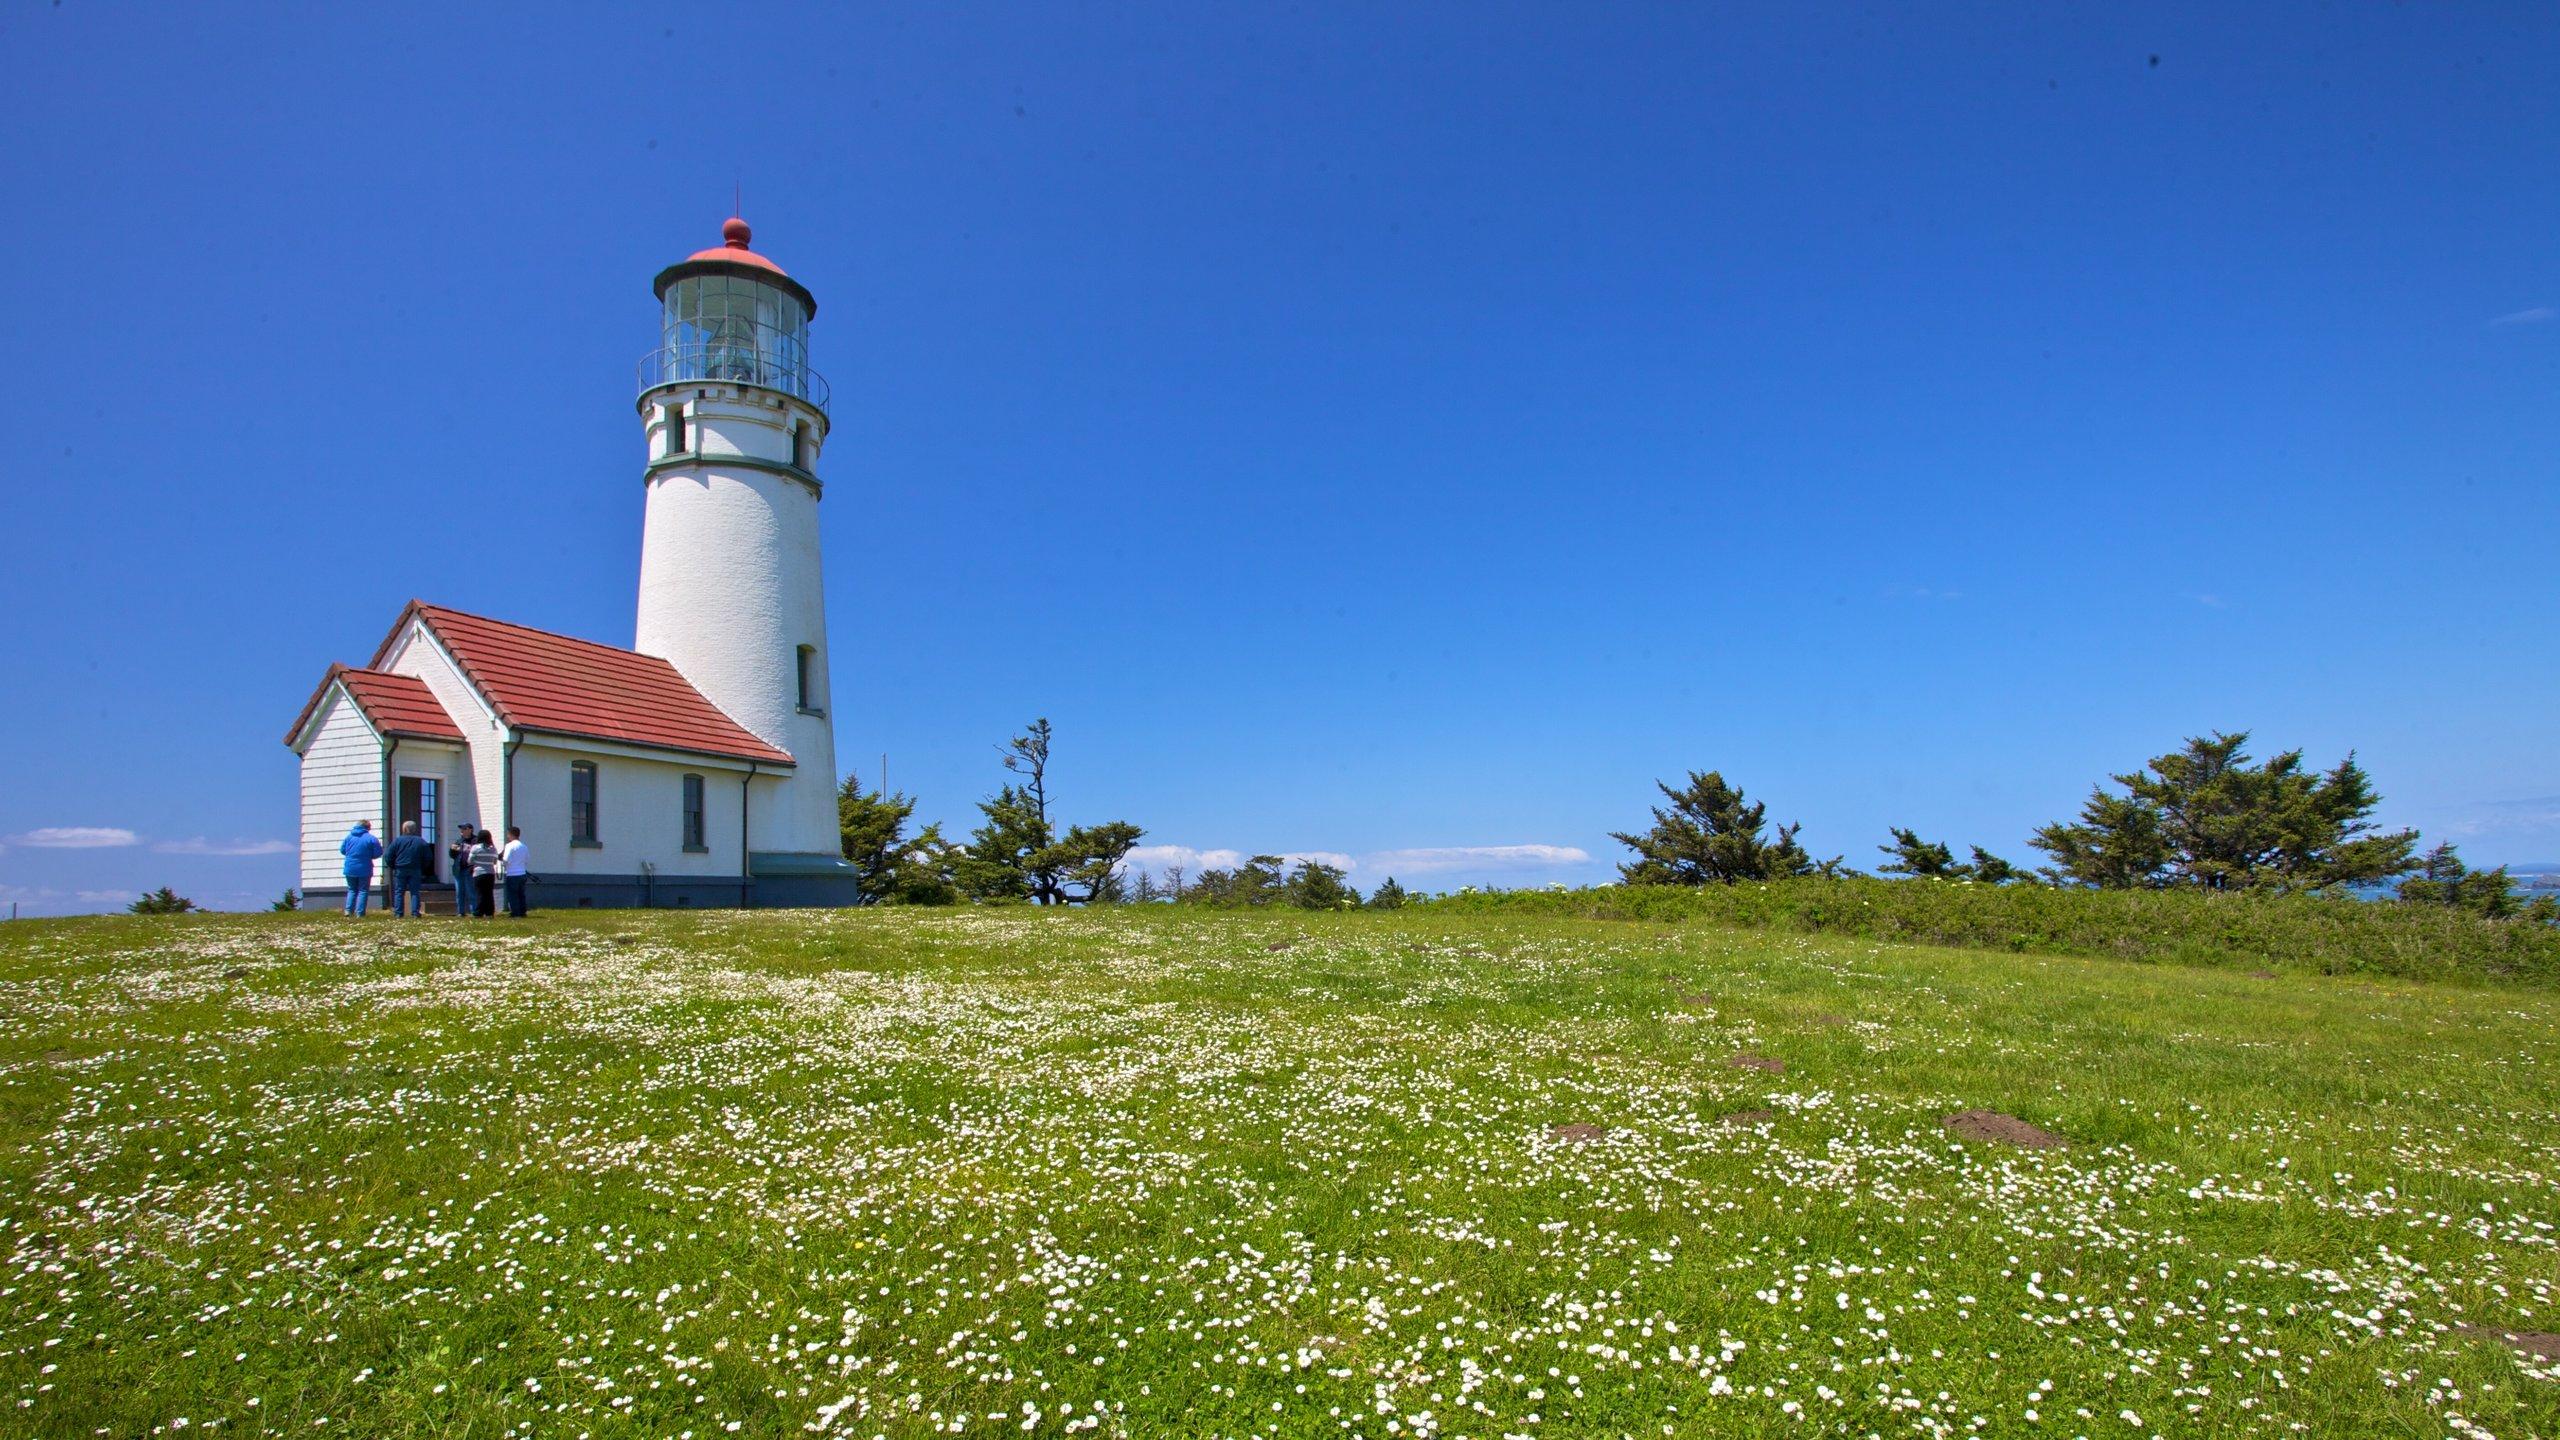 Oregon Coast, Oregon, United States of America